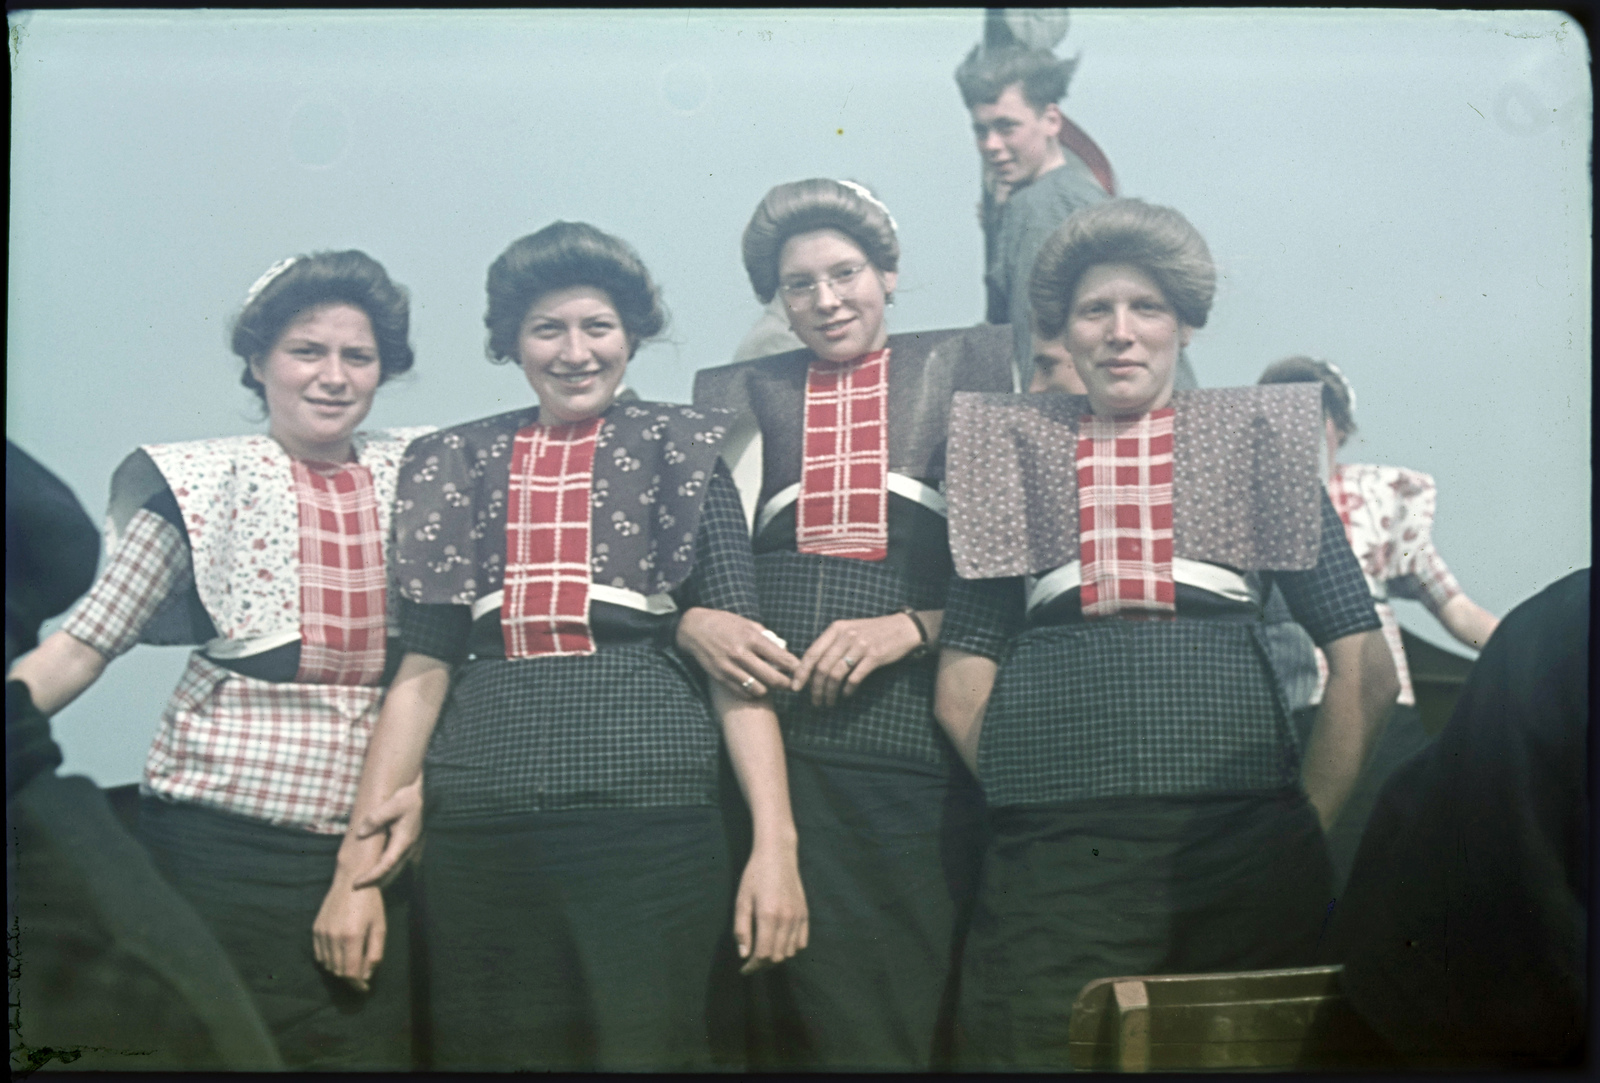 Vrouwen in klederdracht tijdens boottocht.